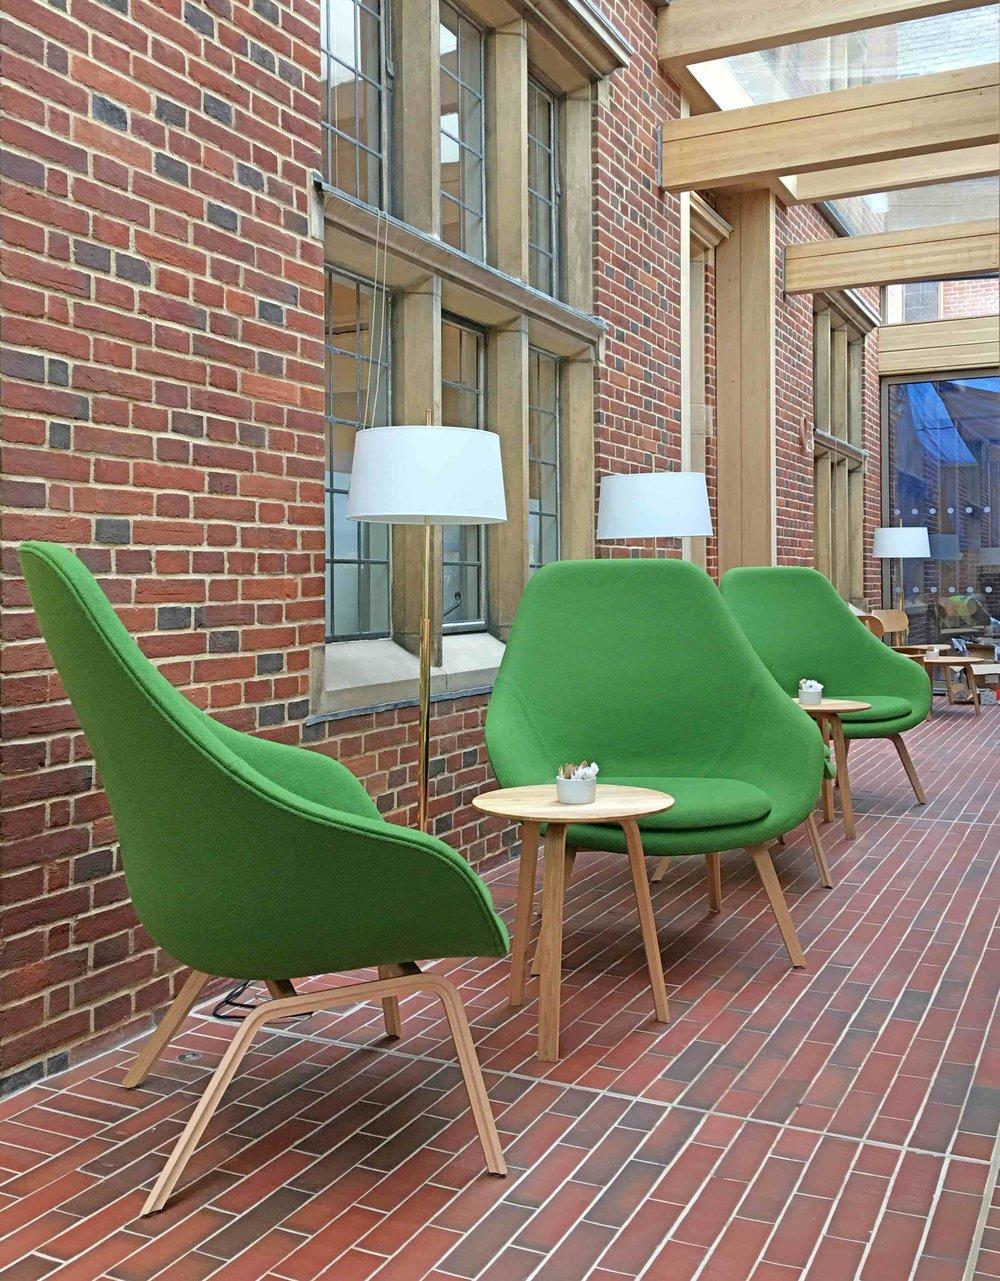 Bespoke furniture design & supply, Interior design & Lighting supply - The University of Cambridge, Jesus College Café